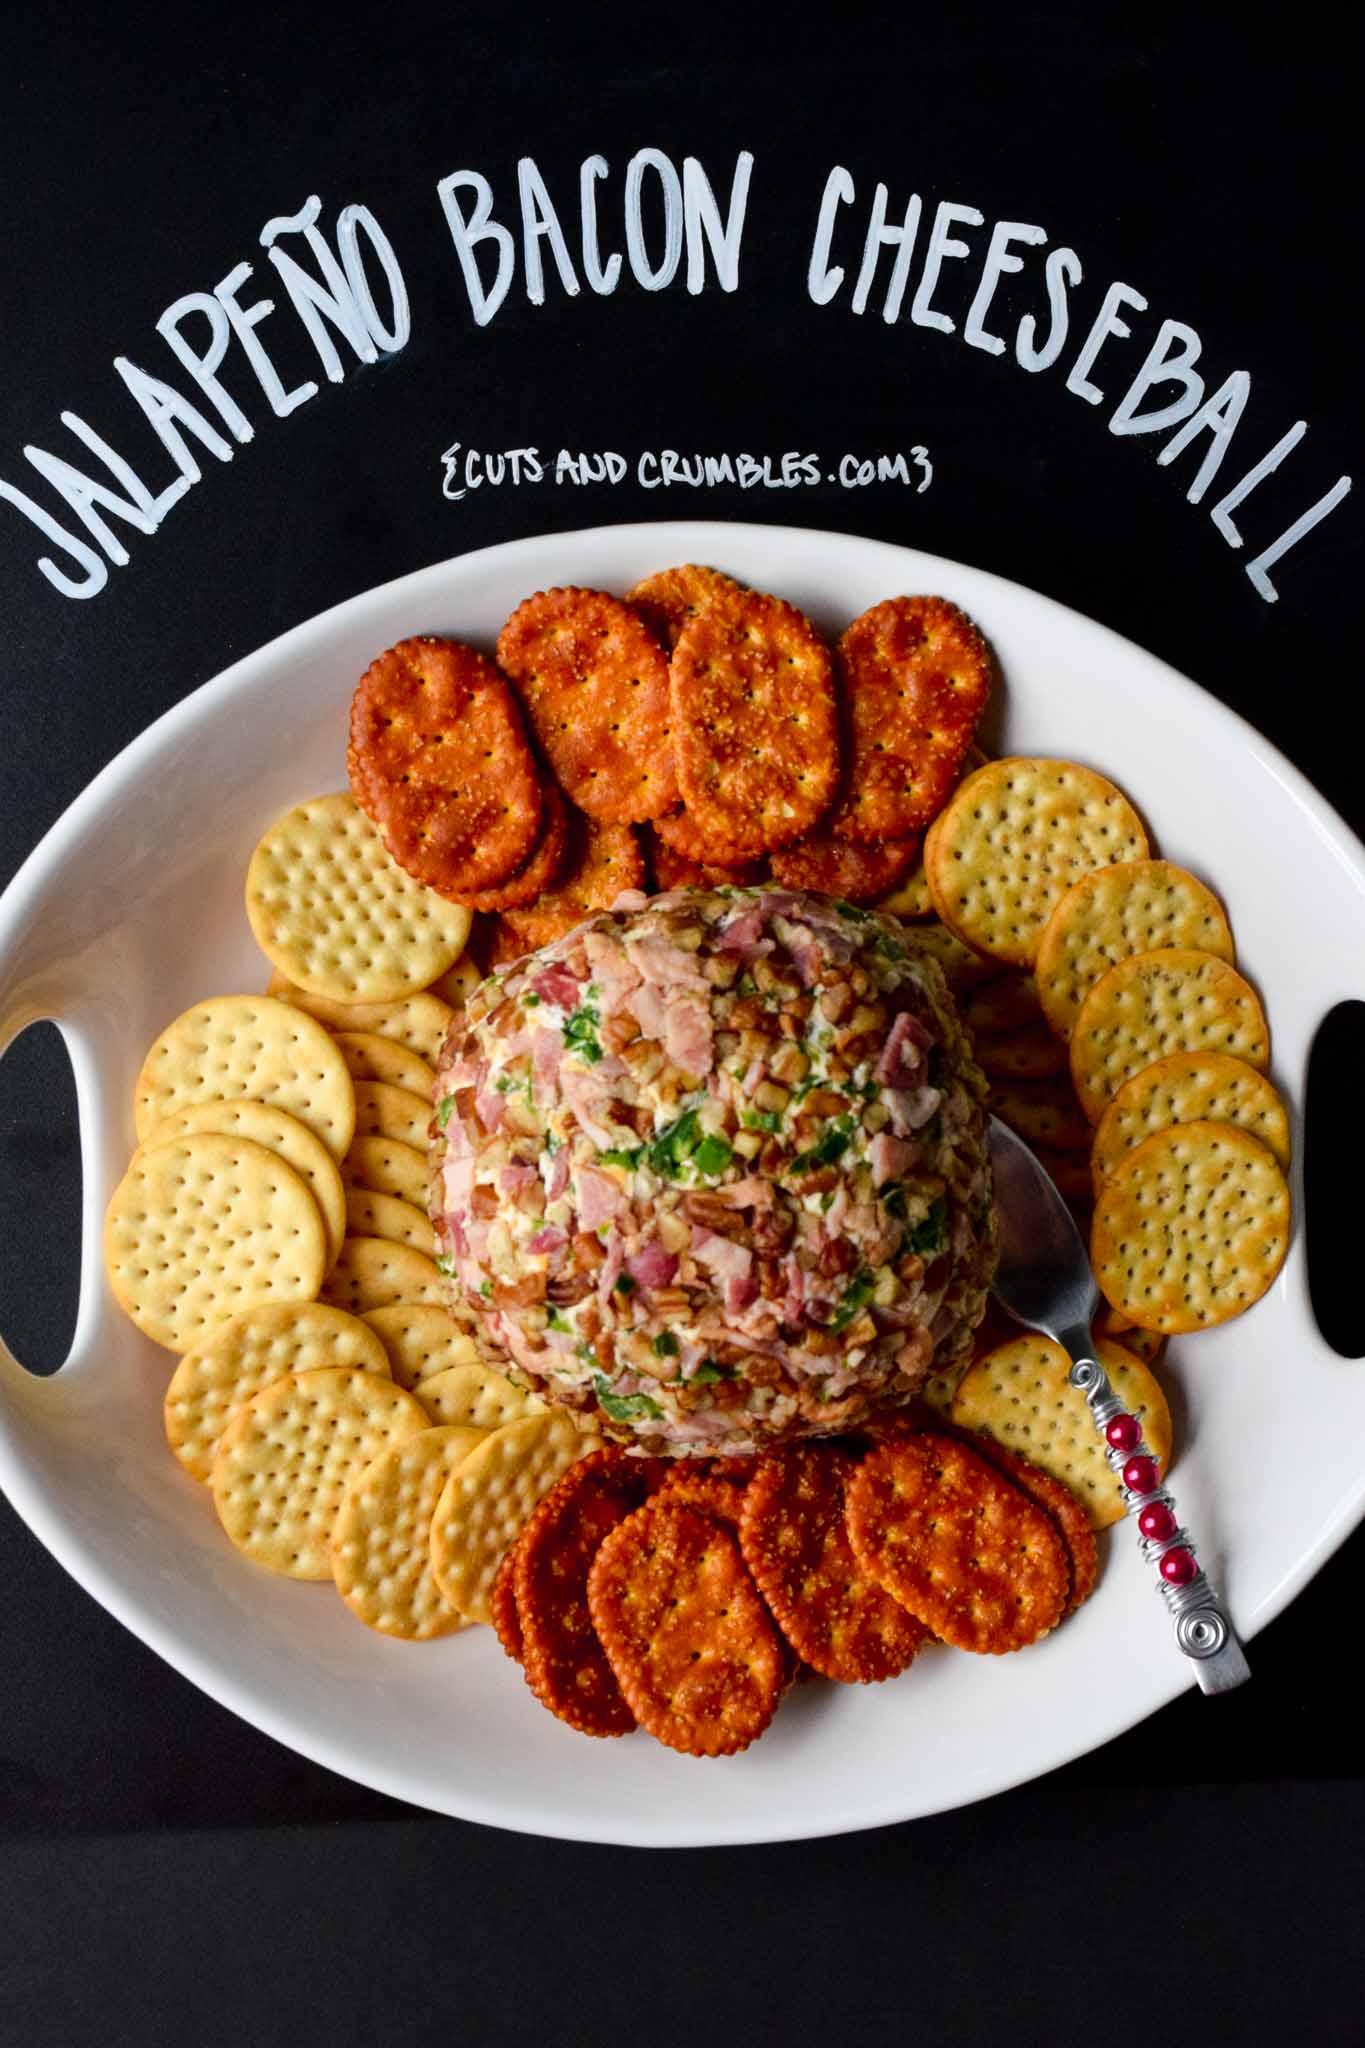 Jalapeño Bacon Cheeseball with title written on chalkboard